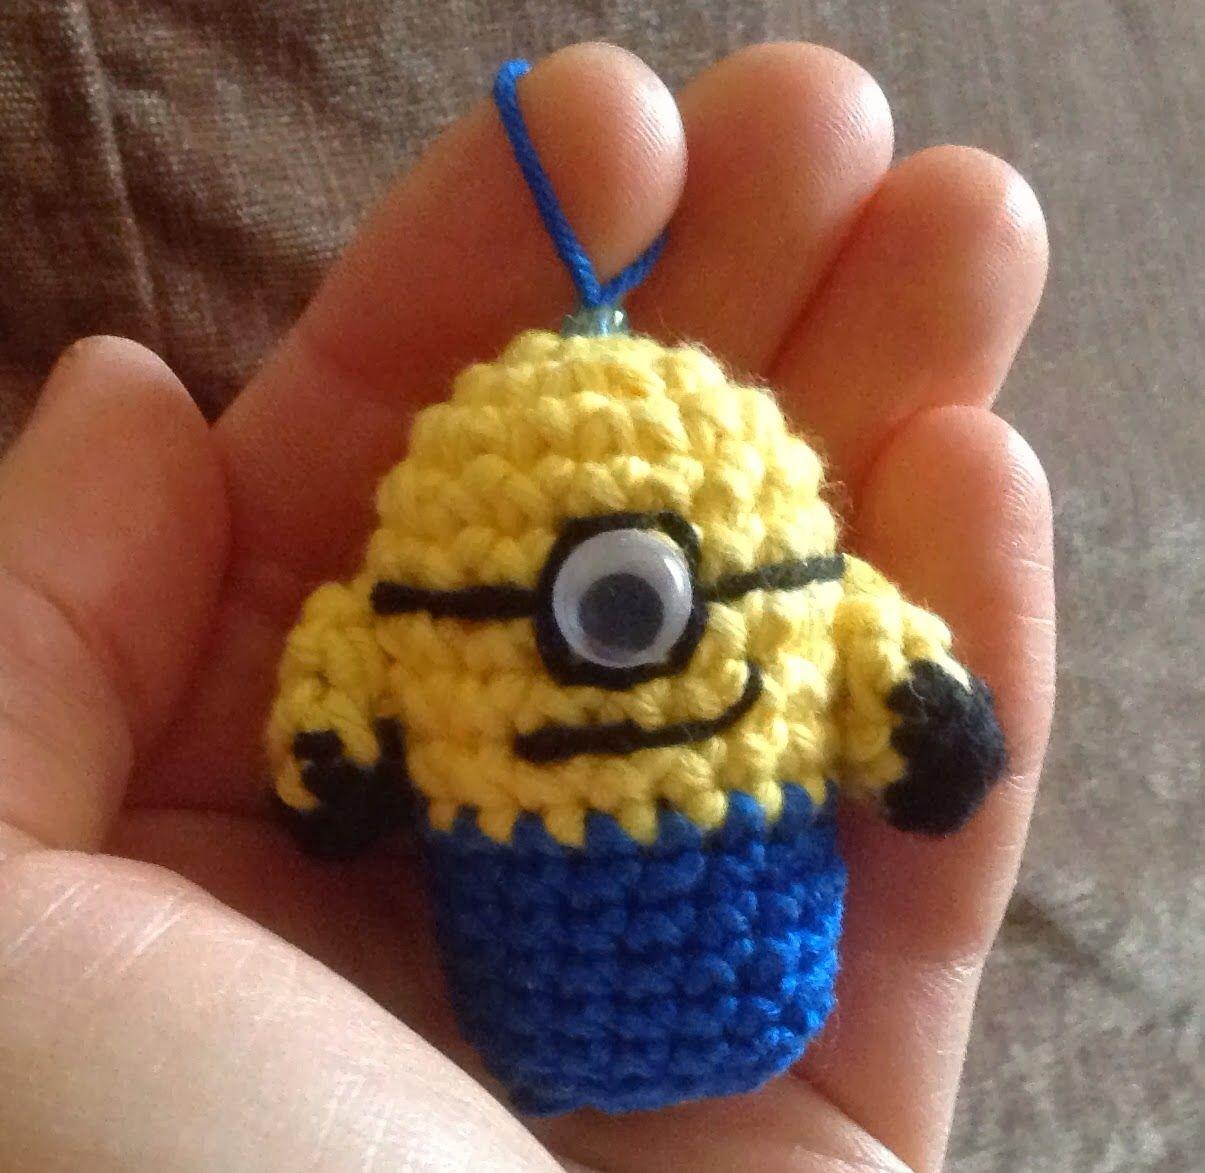 Annies DIY: Minion Schlüsselanhänger Crochet Häkeln Häkelanleitung ...